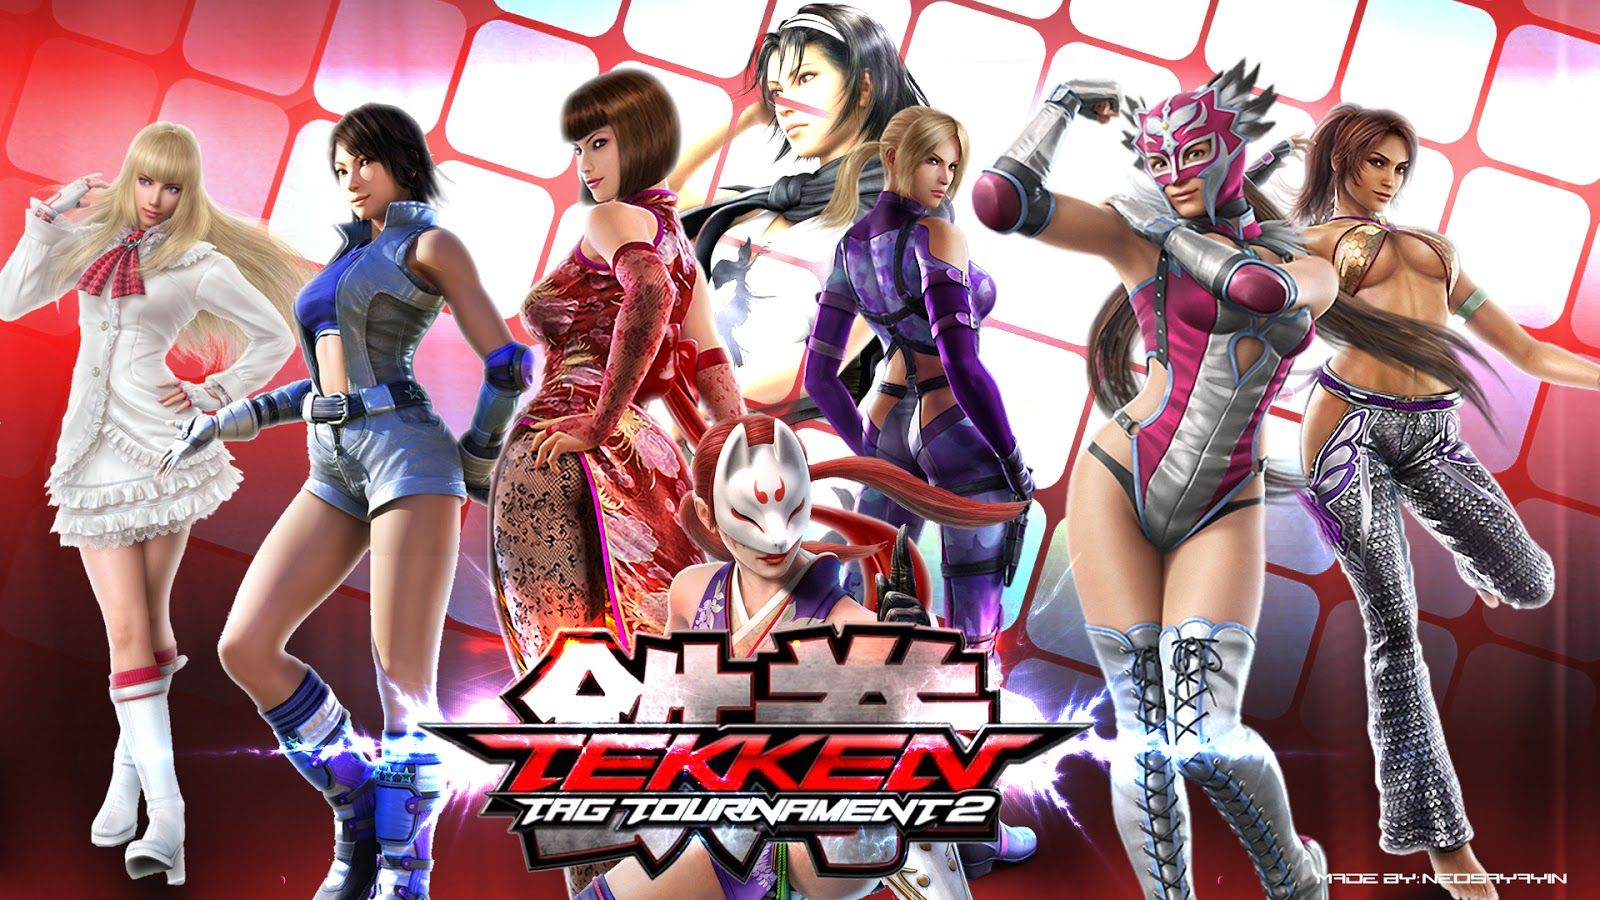 tekken tag tournament 2 all characters wallpaper